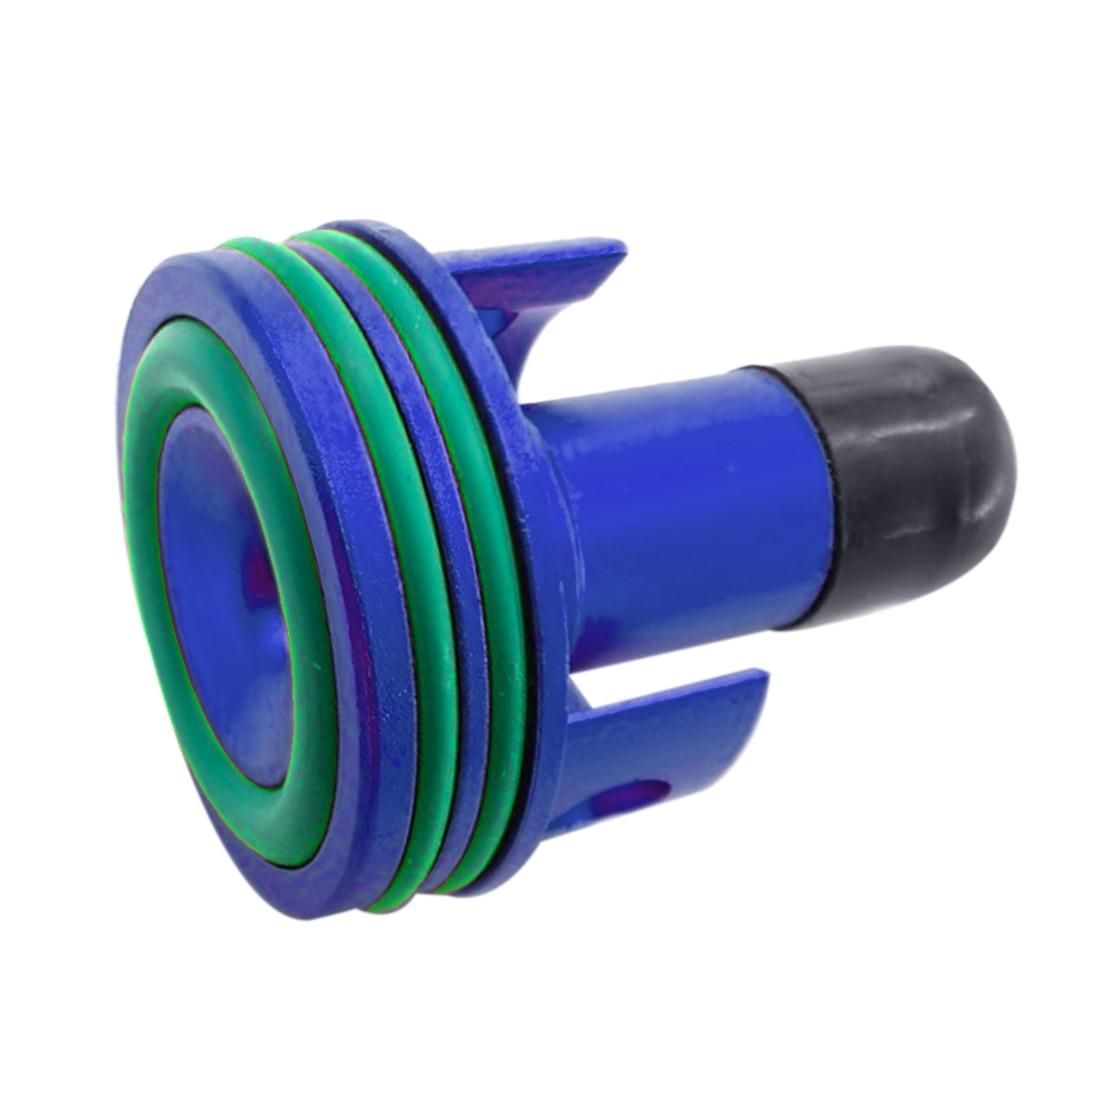 Cabezal de cilindro de aluminio y boquilla de sellado de aire de anillo redondo para caja de cambios JM 8/9/10/Qidian